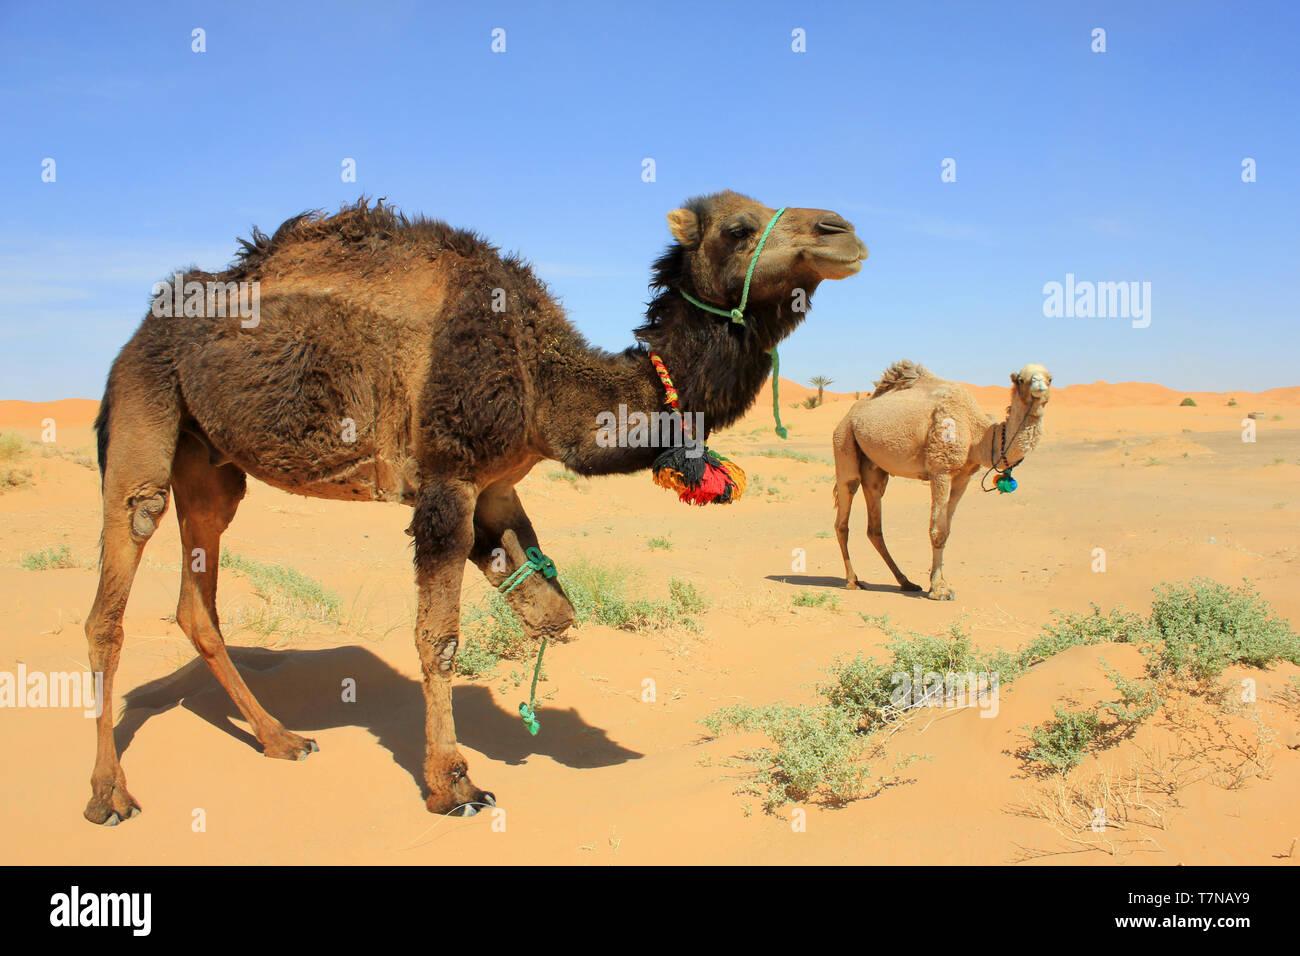 Camels in Sahara Desert, Merzouga, Morocco - Stock Image